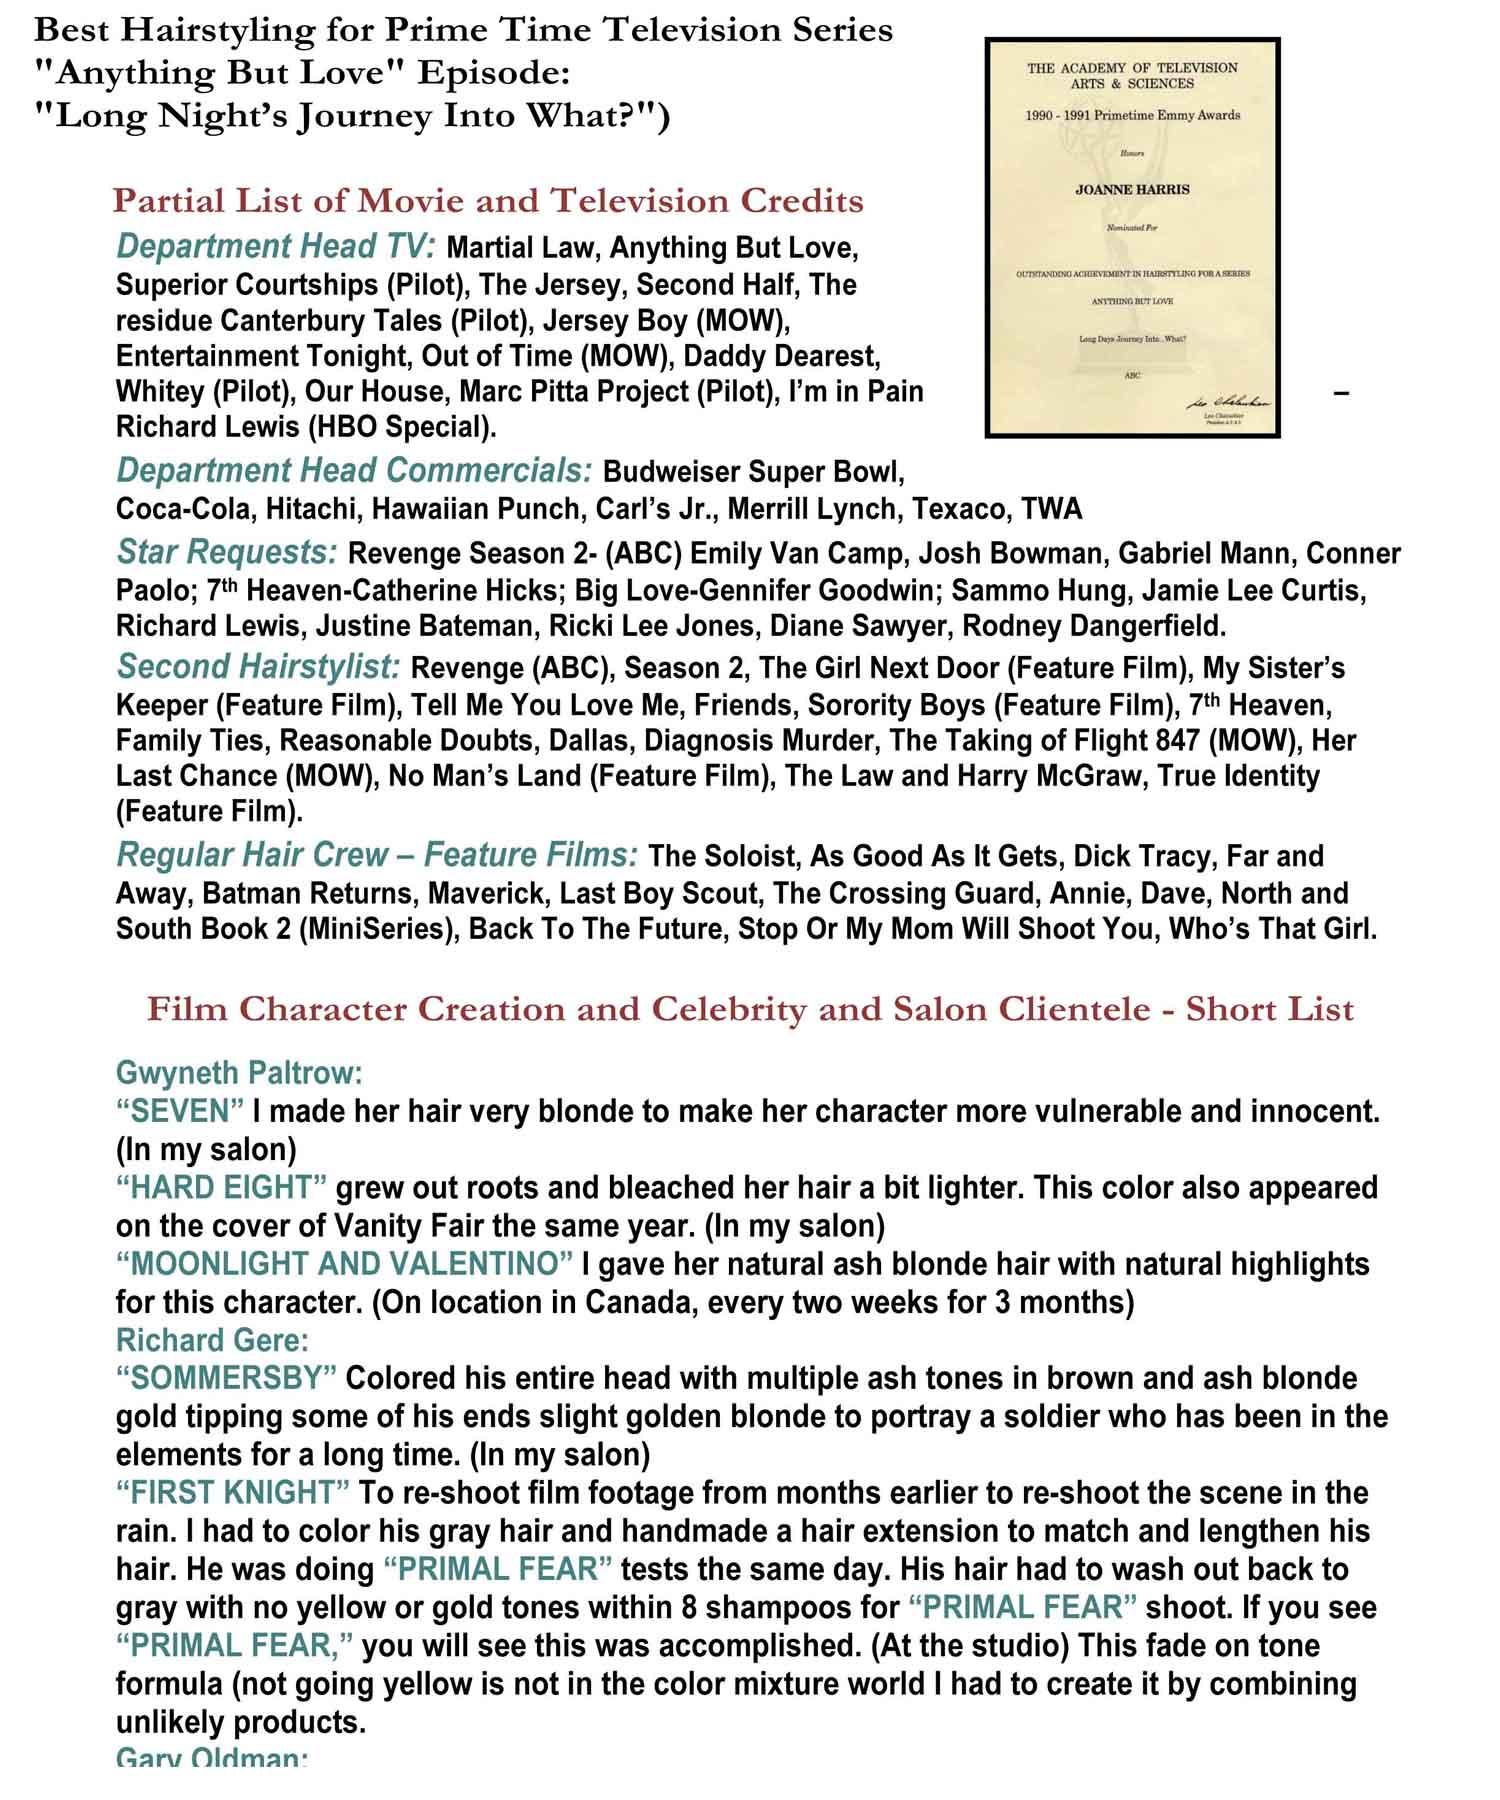 resume-page-2.jpg